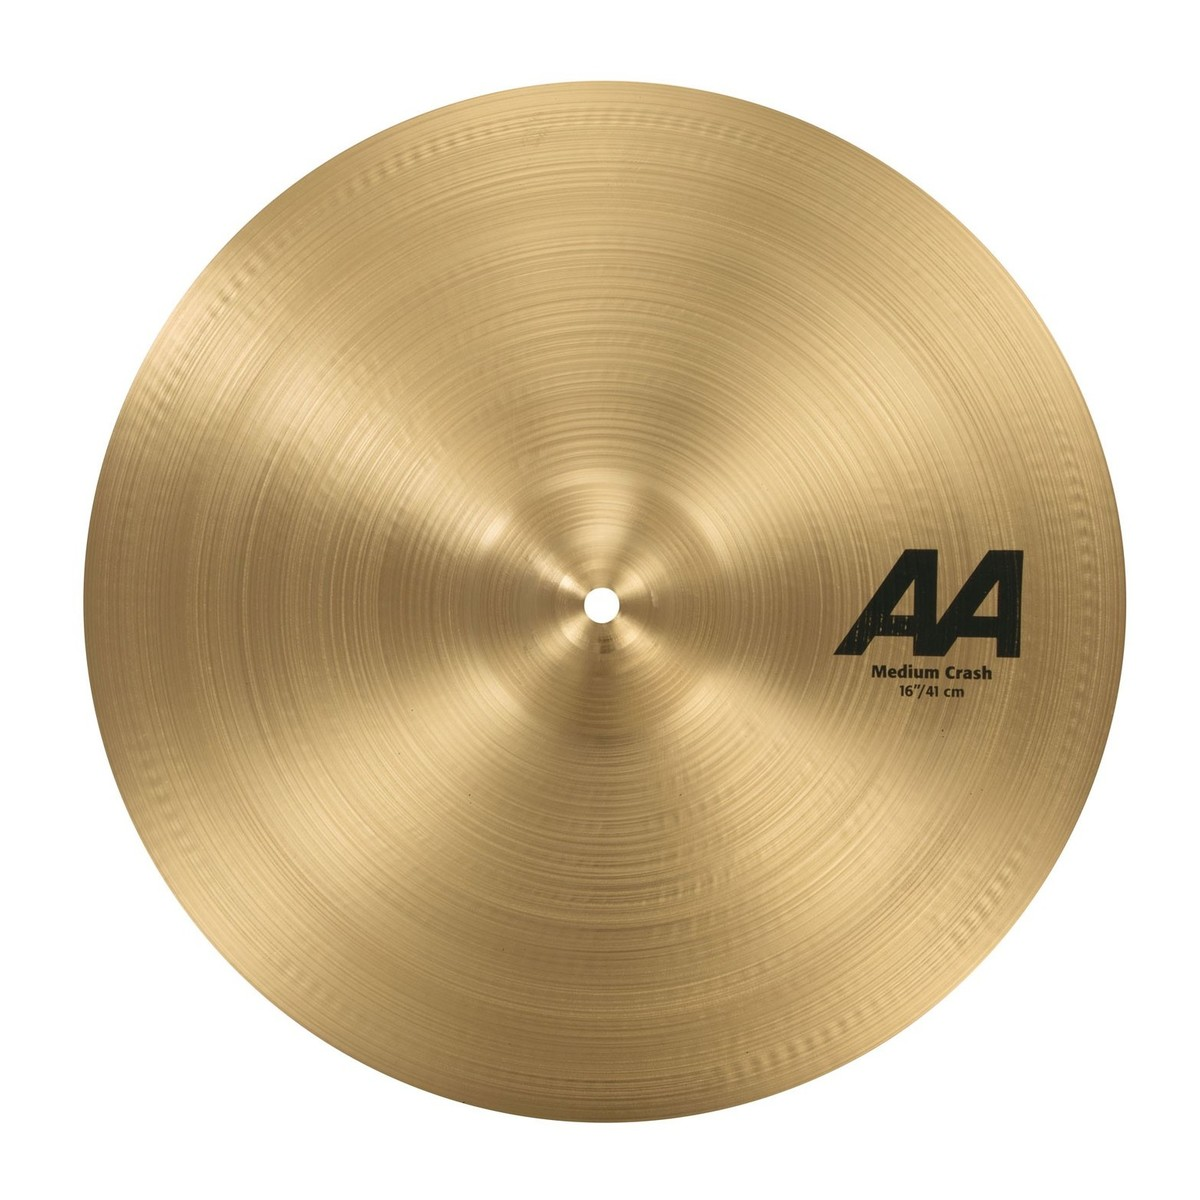 sabian aa 16 39 39 medium crash cymbal at gear4music. Black Bedroom Furniture Sets. Home Design Ideas